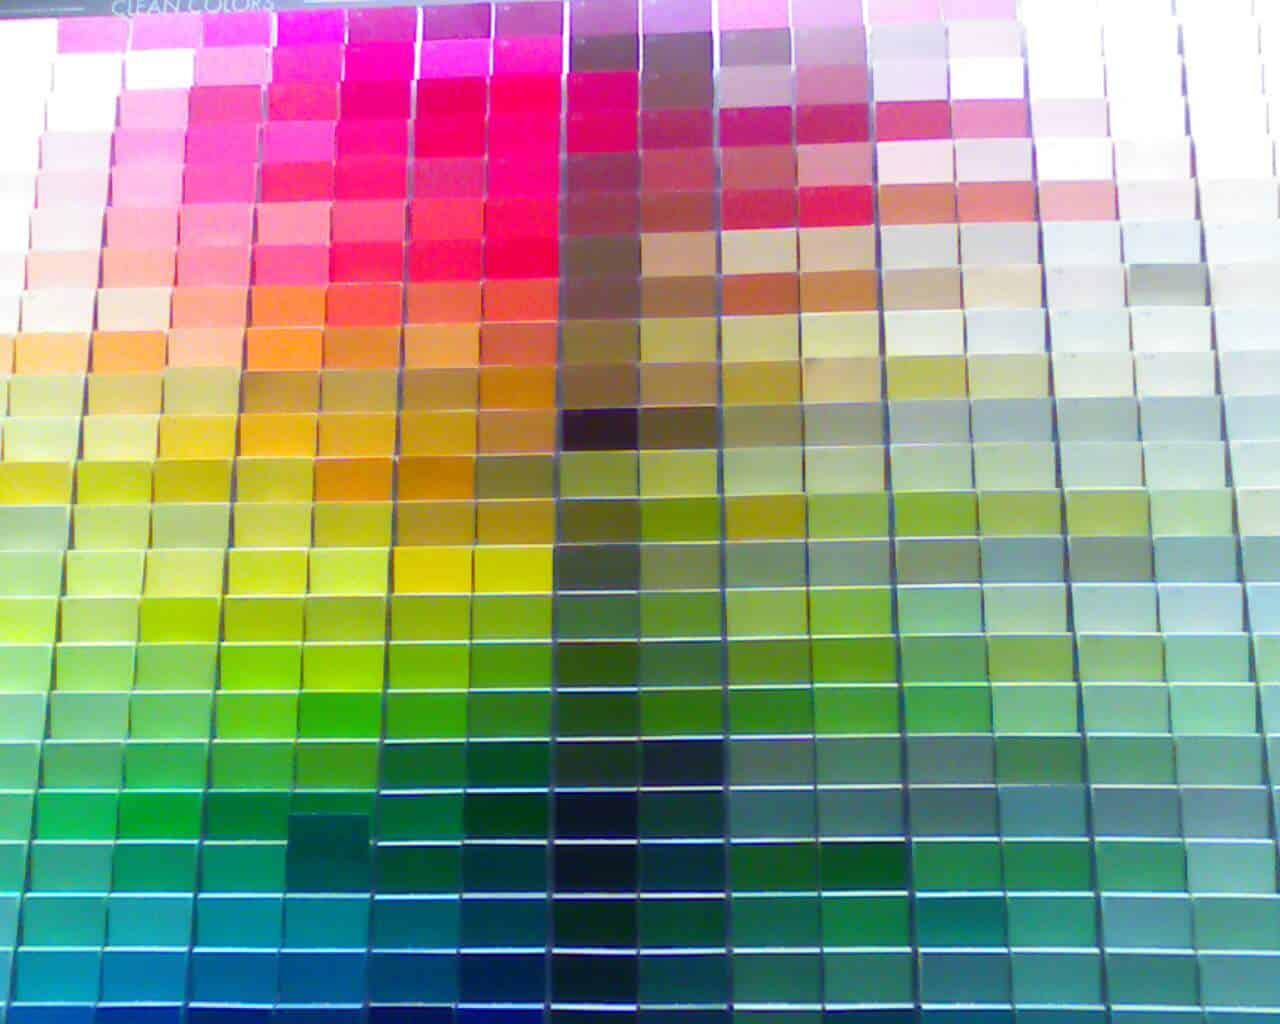 Inspiration Thursday Paint Chips Artquiltmaker Blog